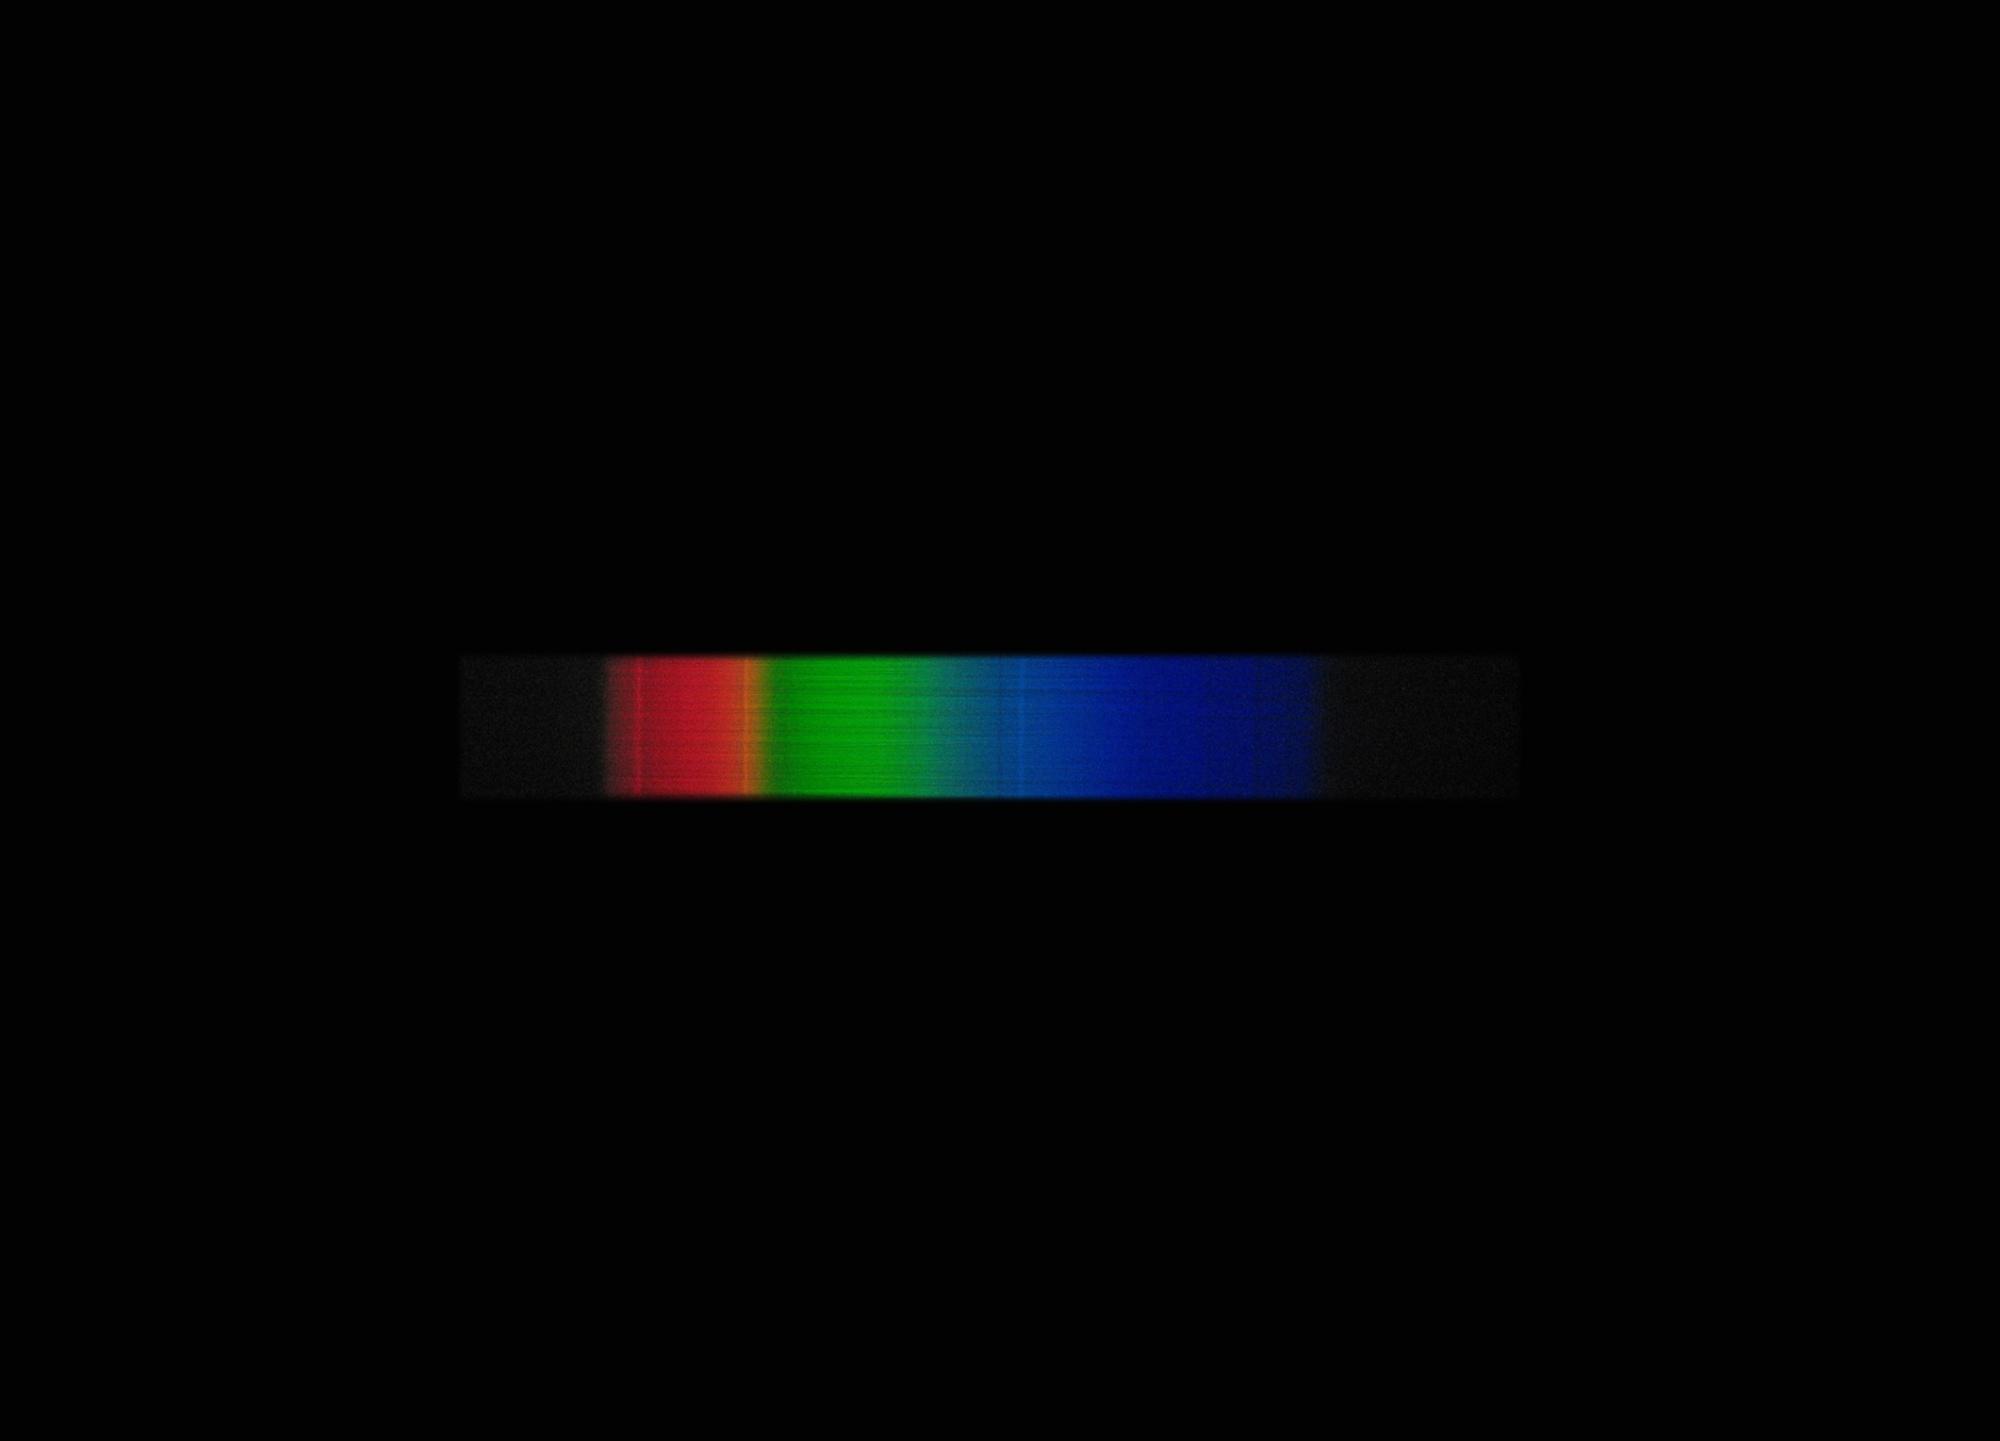 Lyr beta minimum_B7Vpe_20-8-2021-21htu_0138-140.jpg